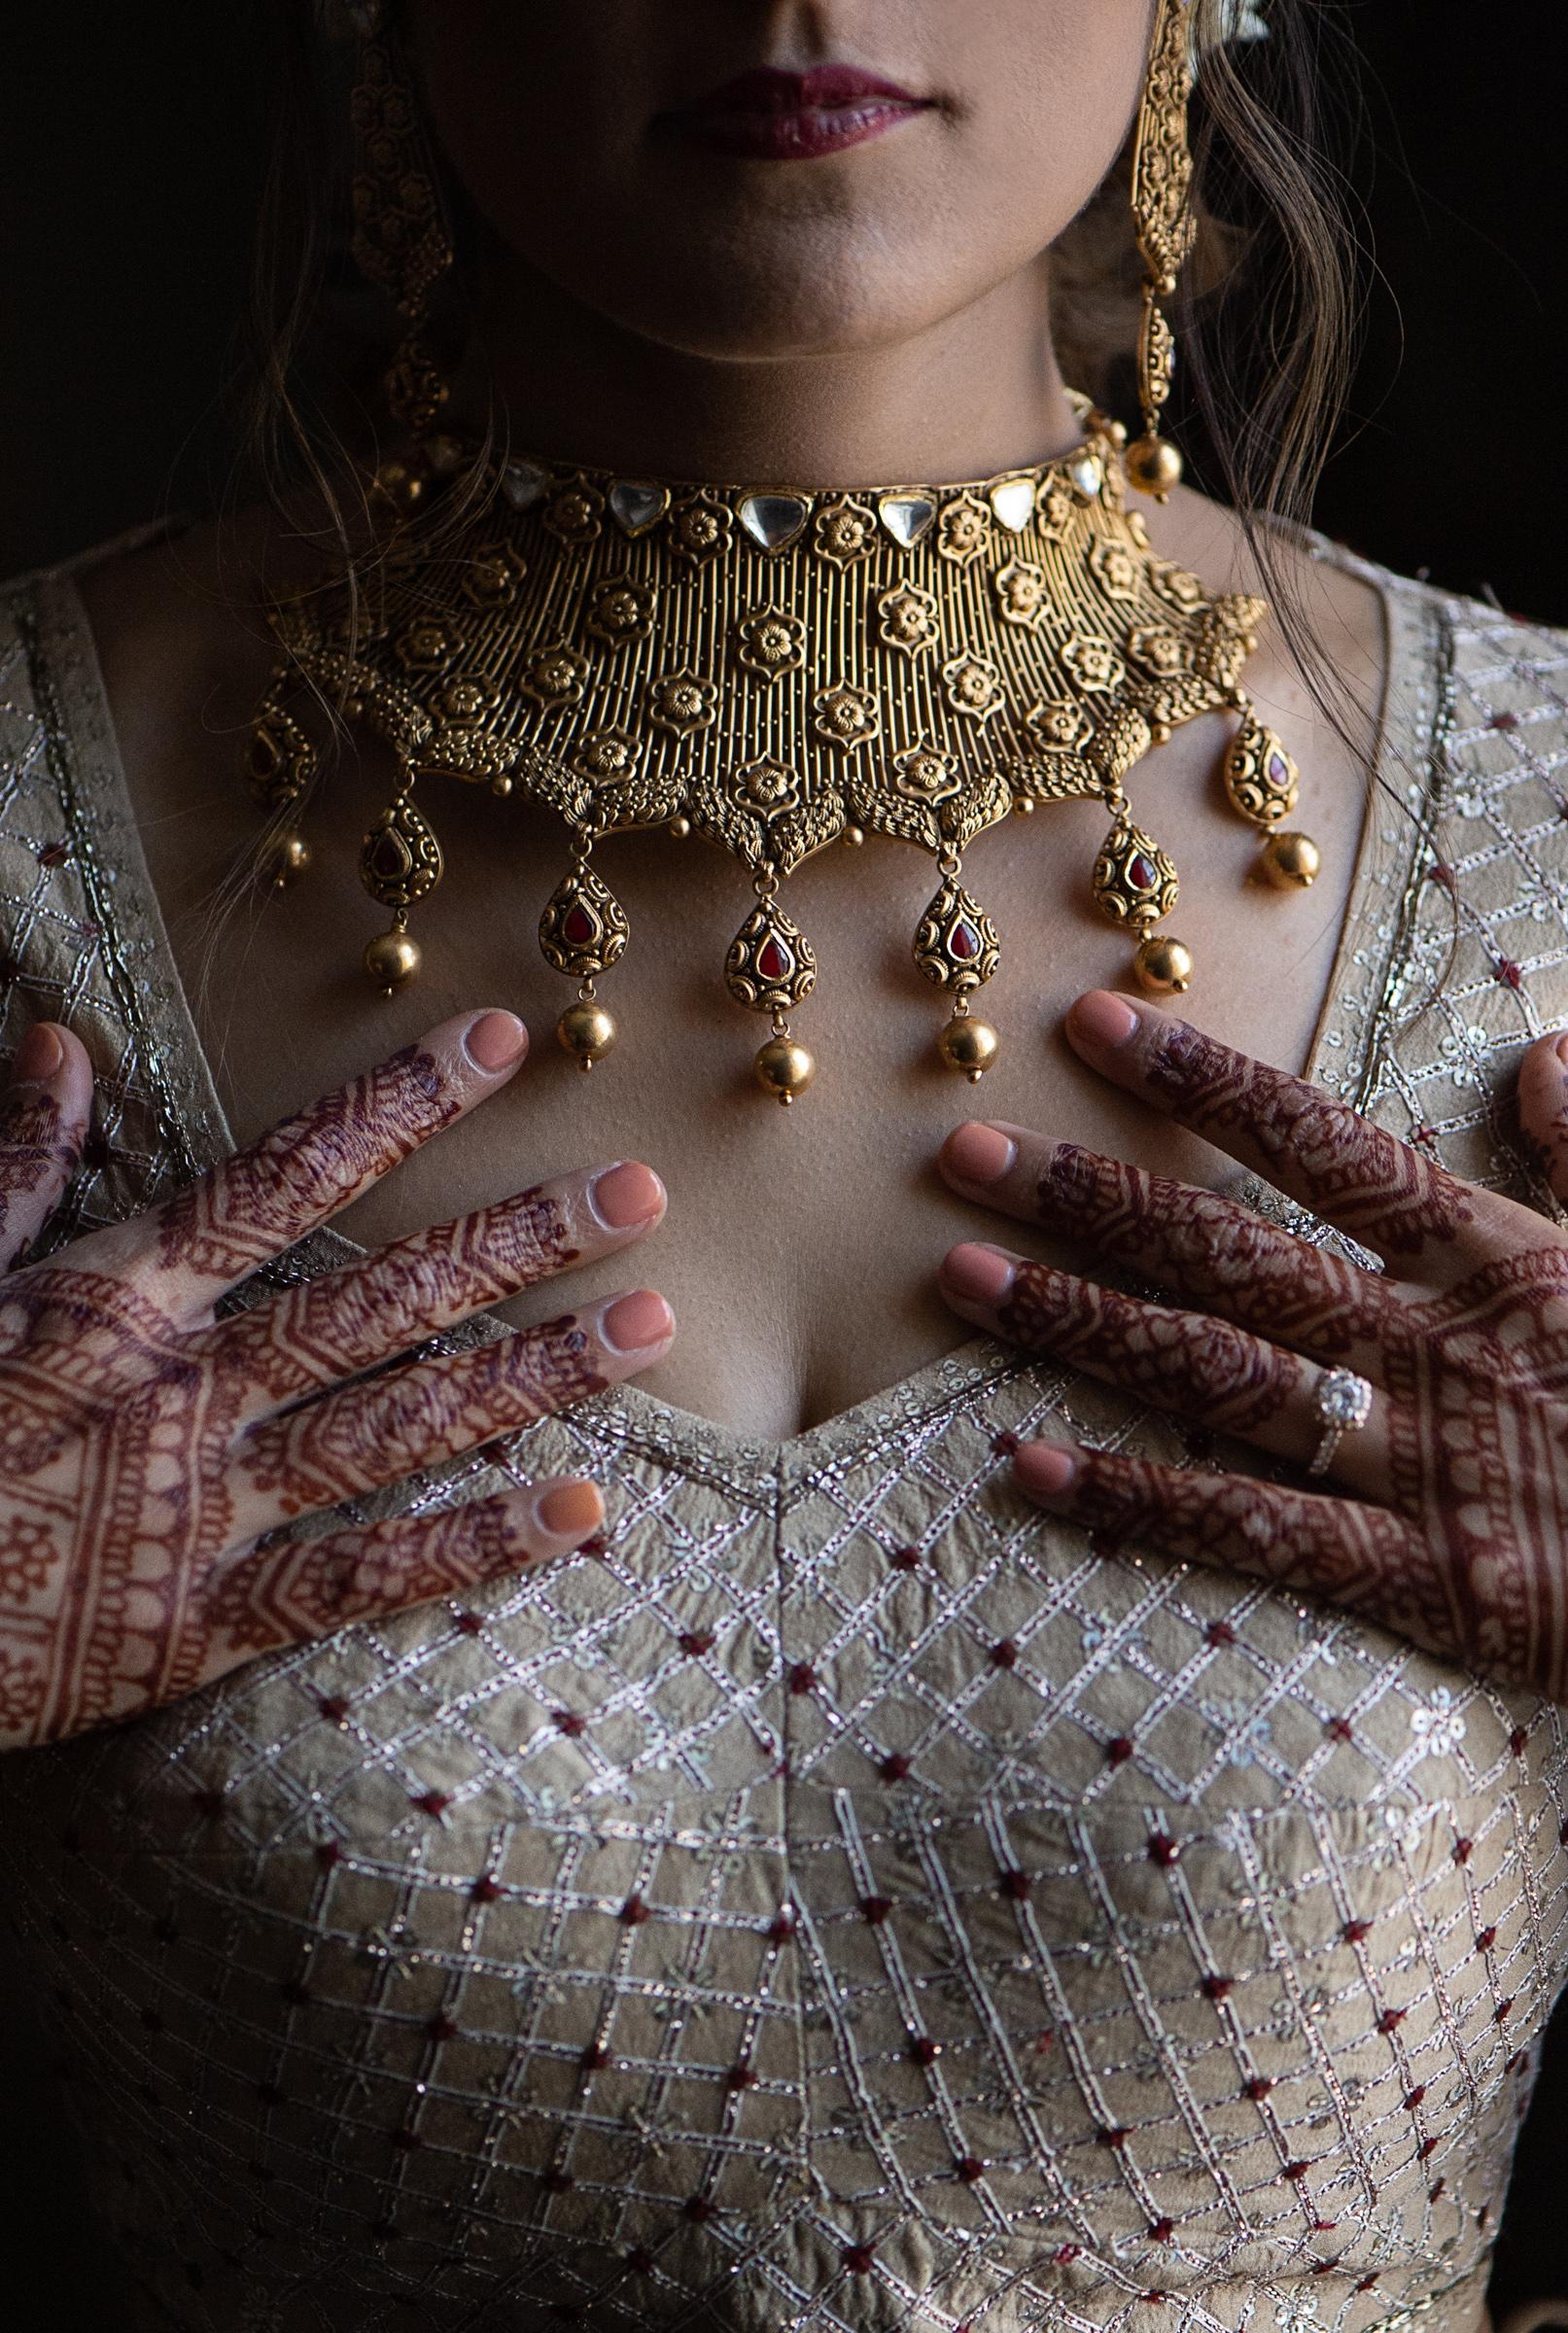 Bride with henna hands - photo by Steve & Jane - Washington D.C.